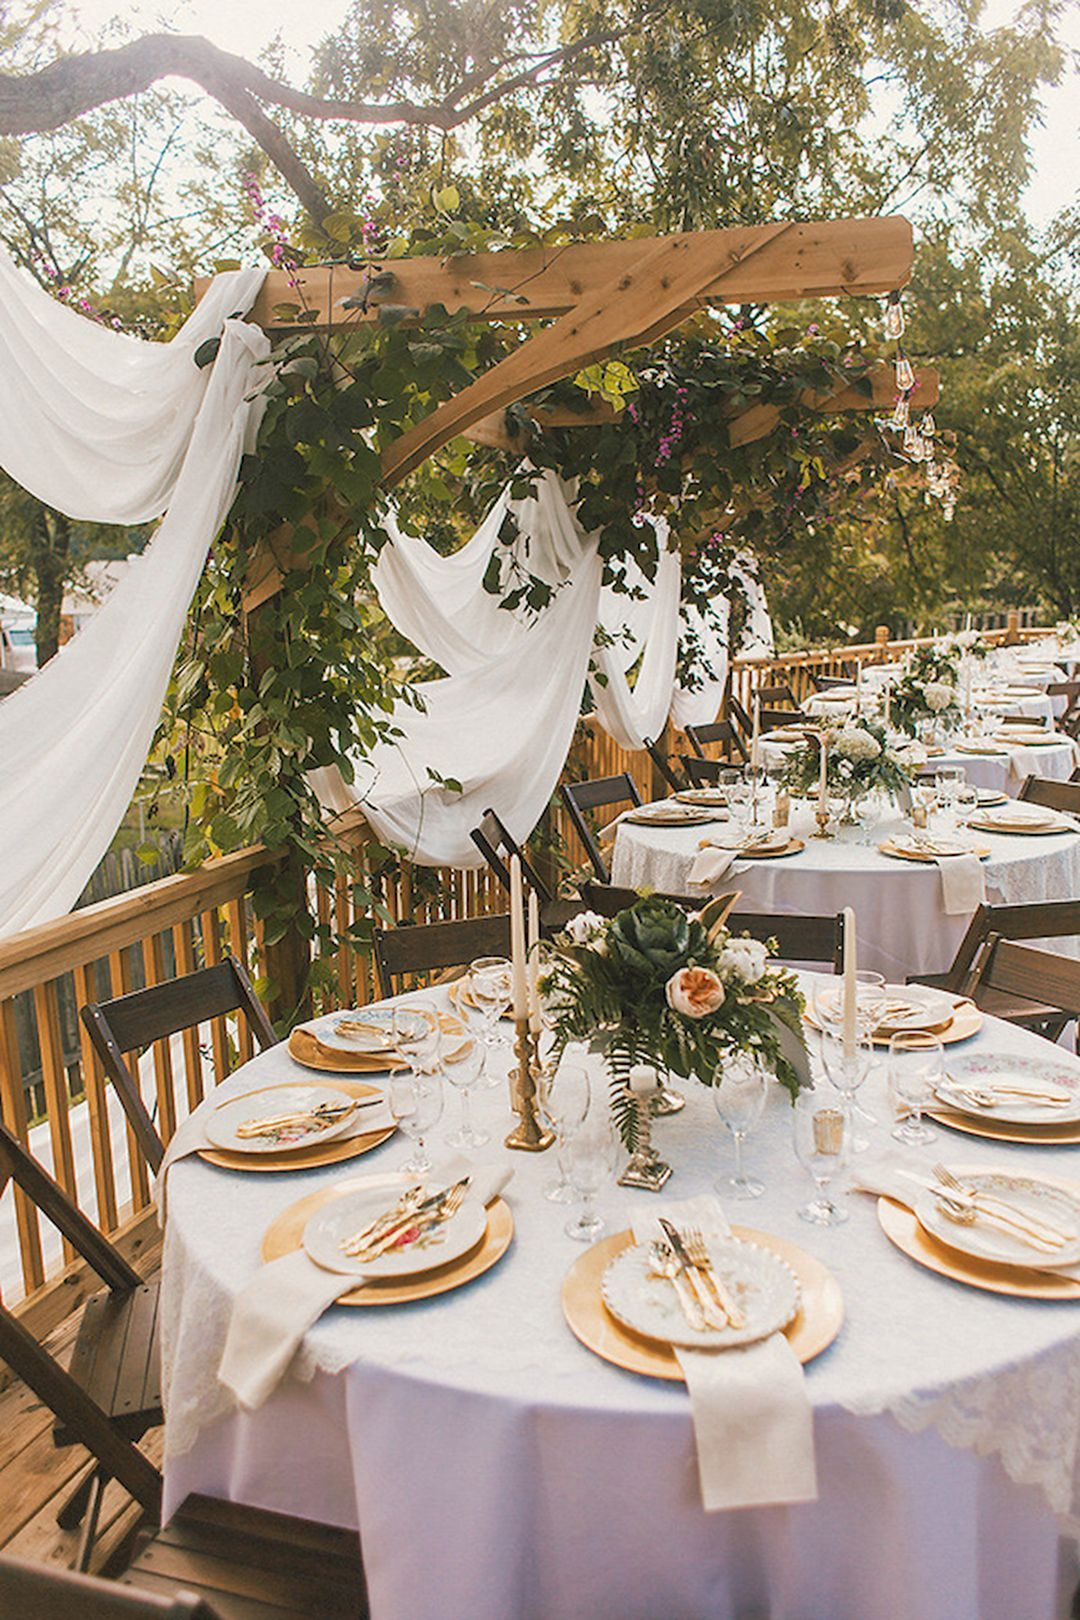 35 incredible backyard wedding party ideas 2017 wedding 2017